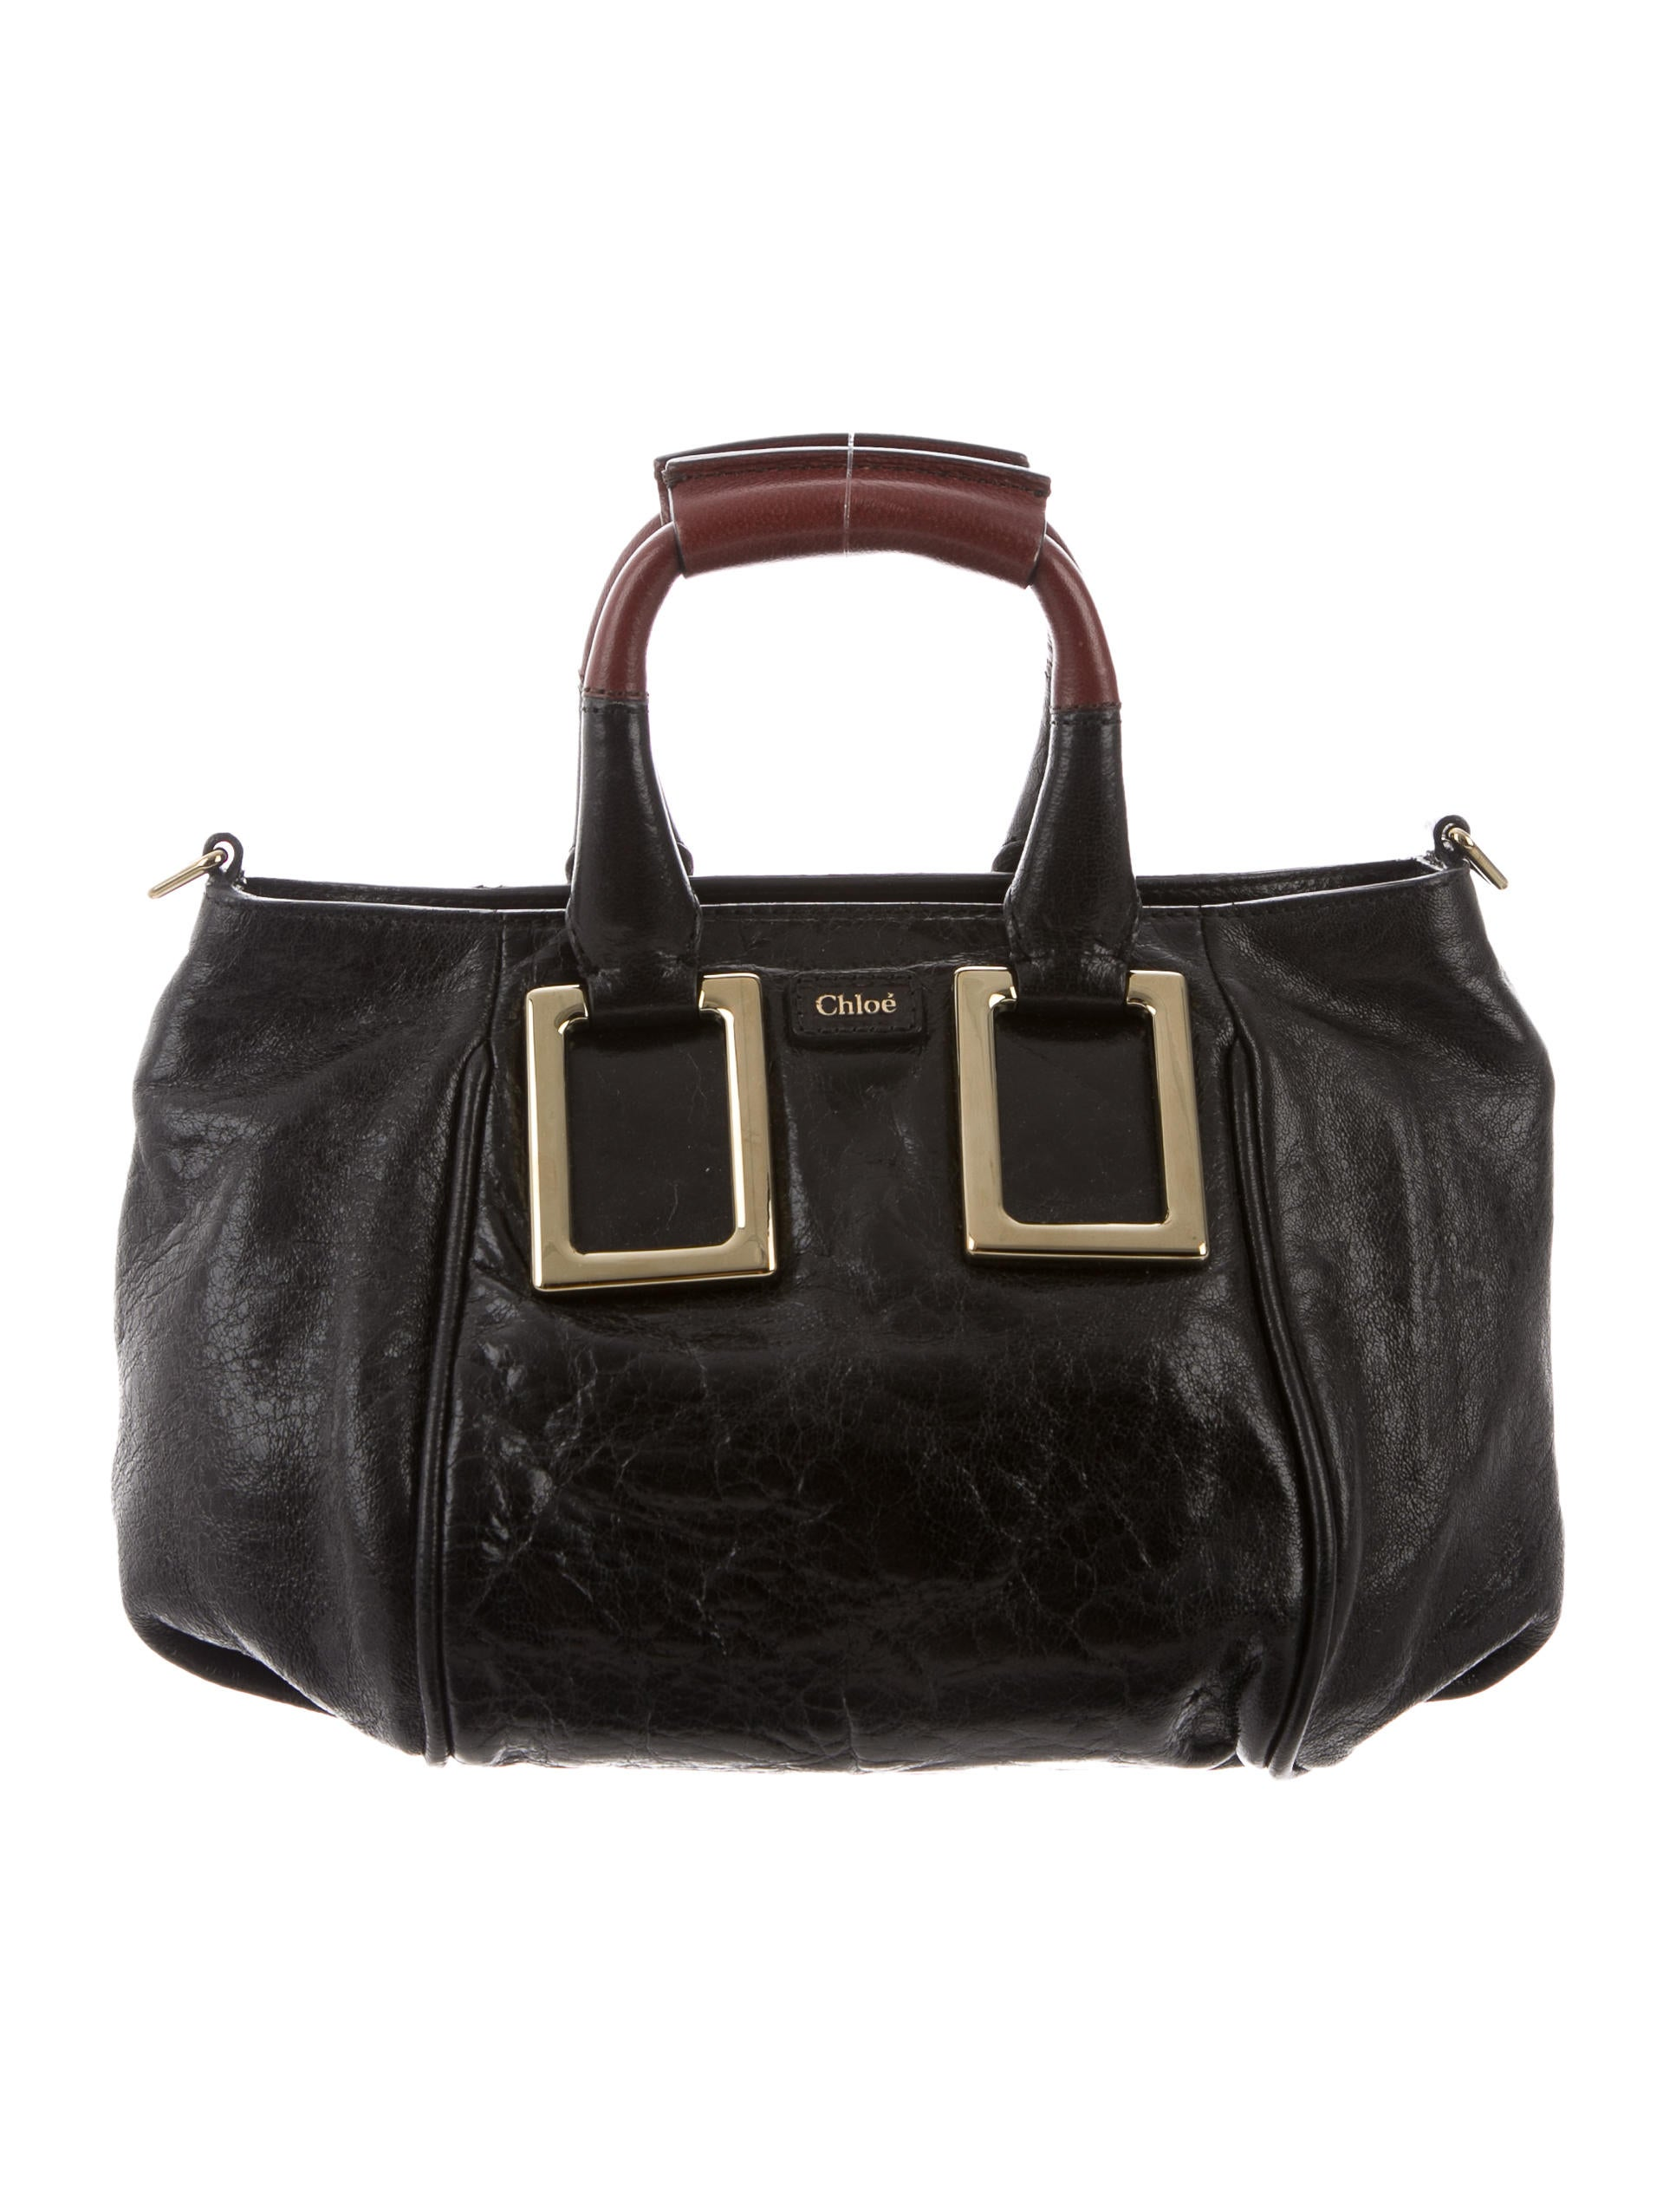 Chloé Small Ethel Bag - Handbags - CHL70832  365b13c61